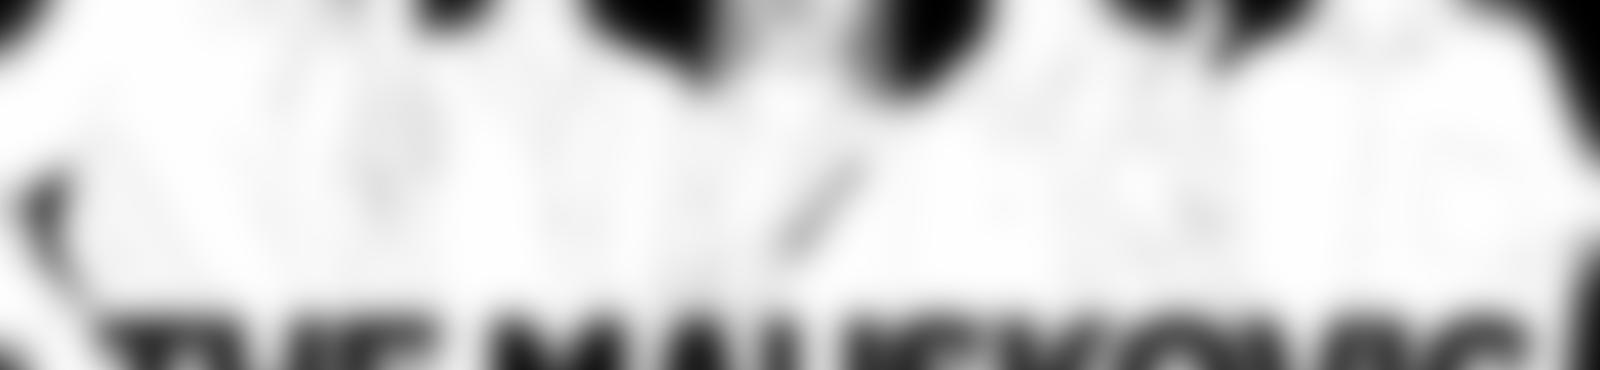 Blurred d71efebe 6279 4377 bea0 7394678a008c